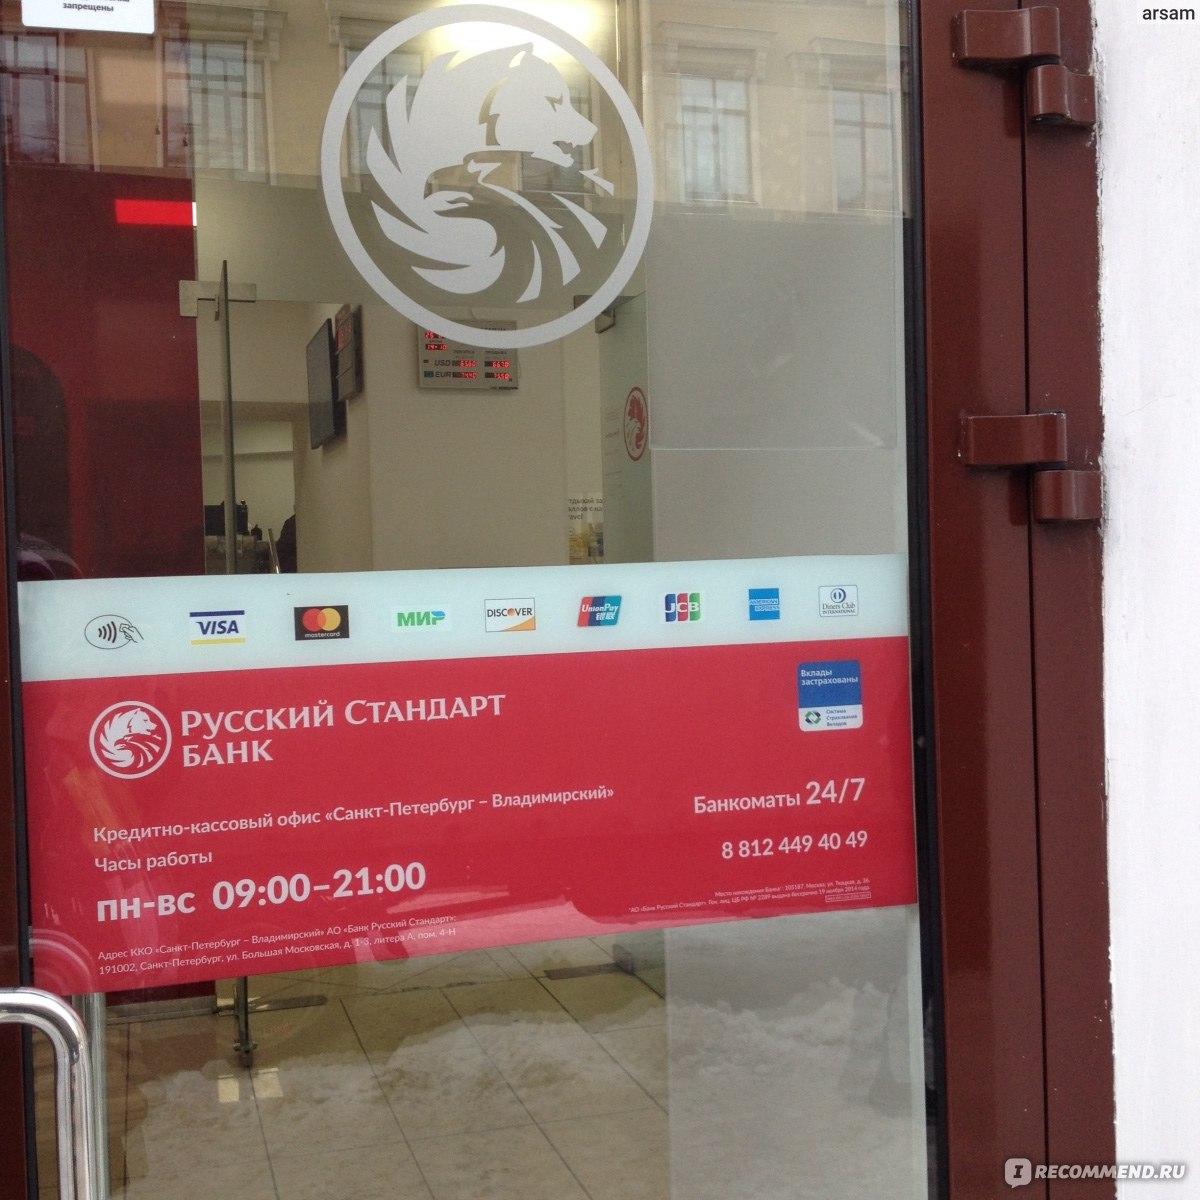 не плачу кредит банку русский стандарт анкета на кредит сбербанка